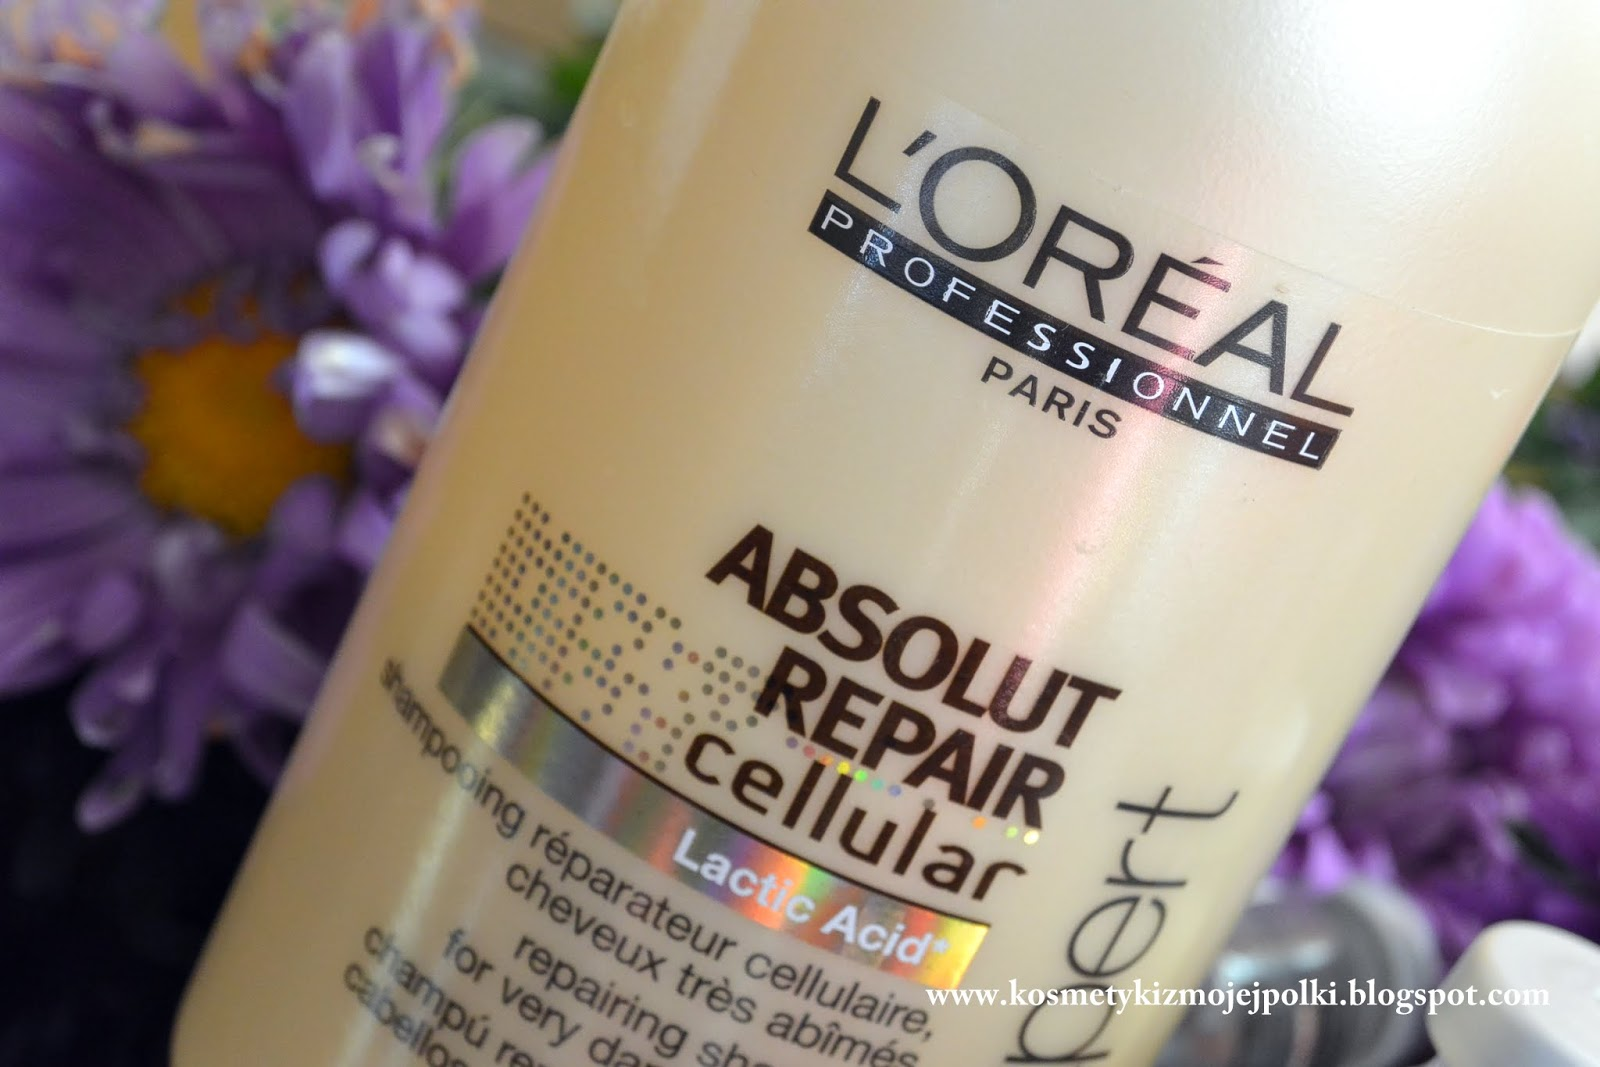 Na ratunek zniszczonym włosom – L'Oreal Professionnel Absolut Repair Cellular